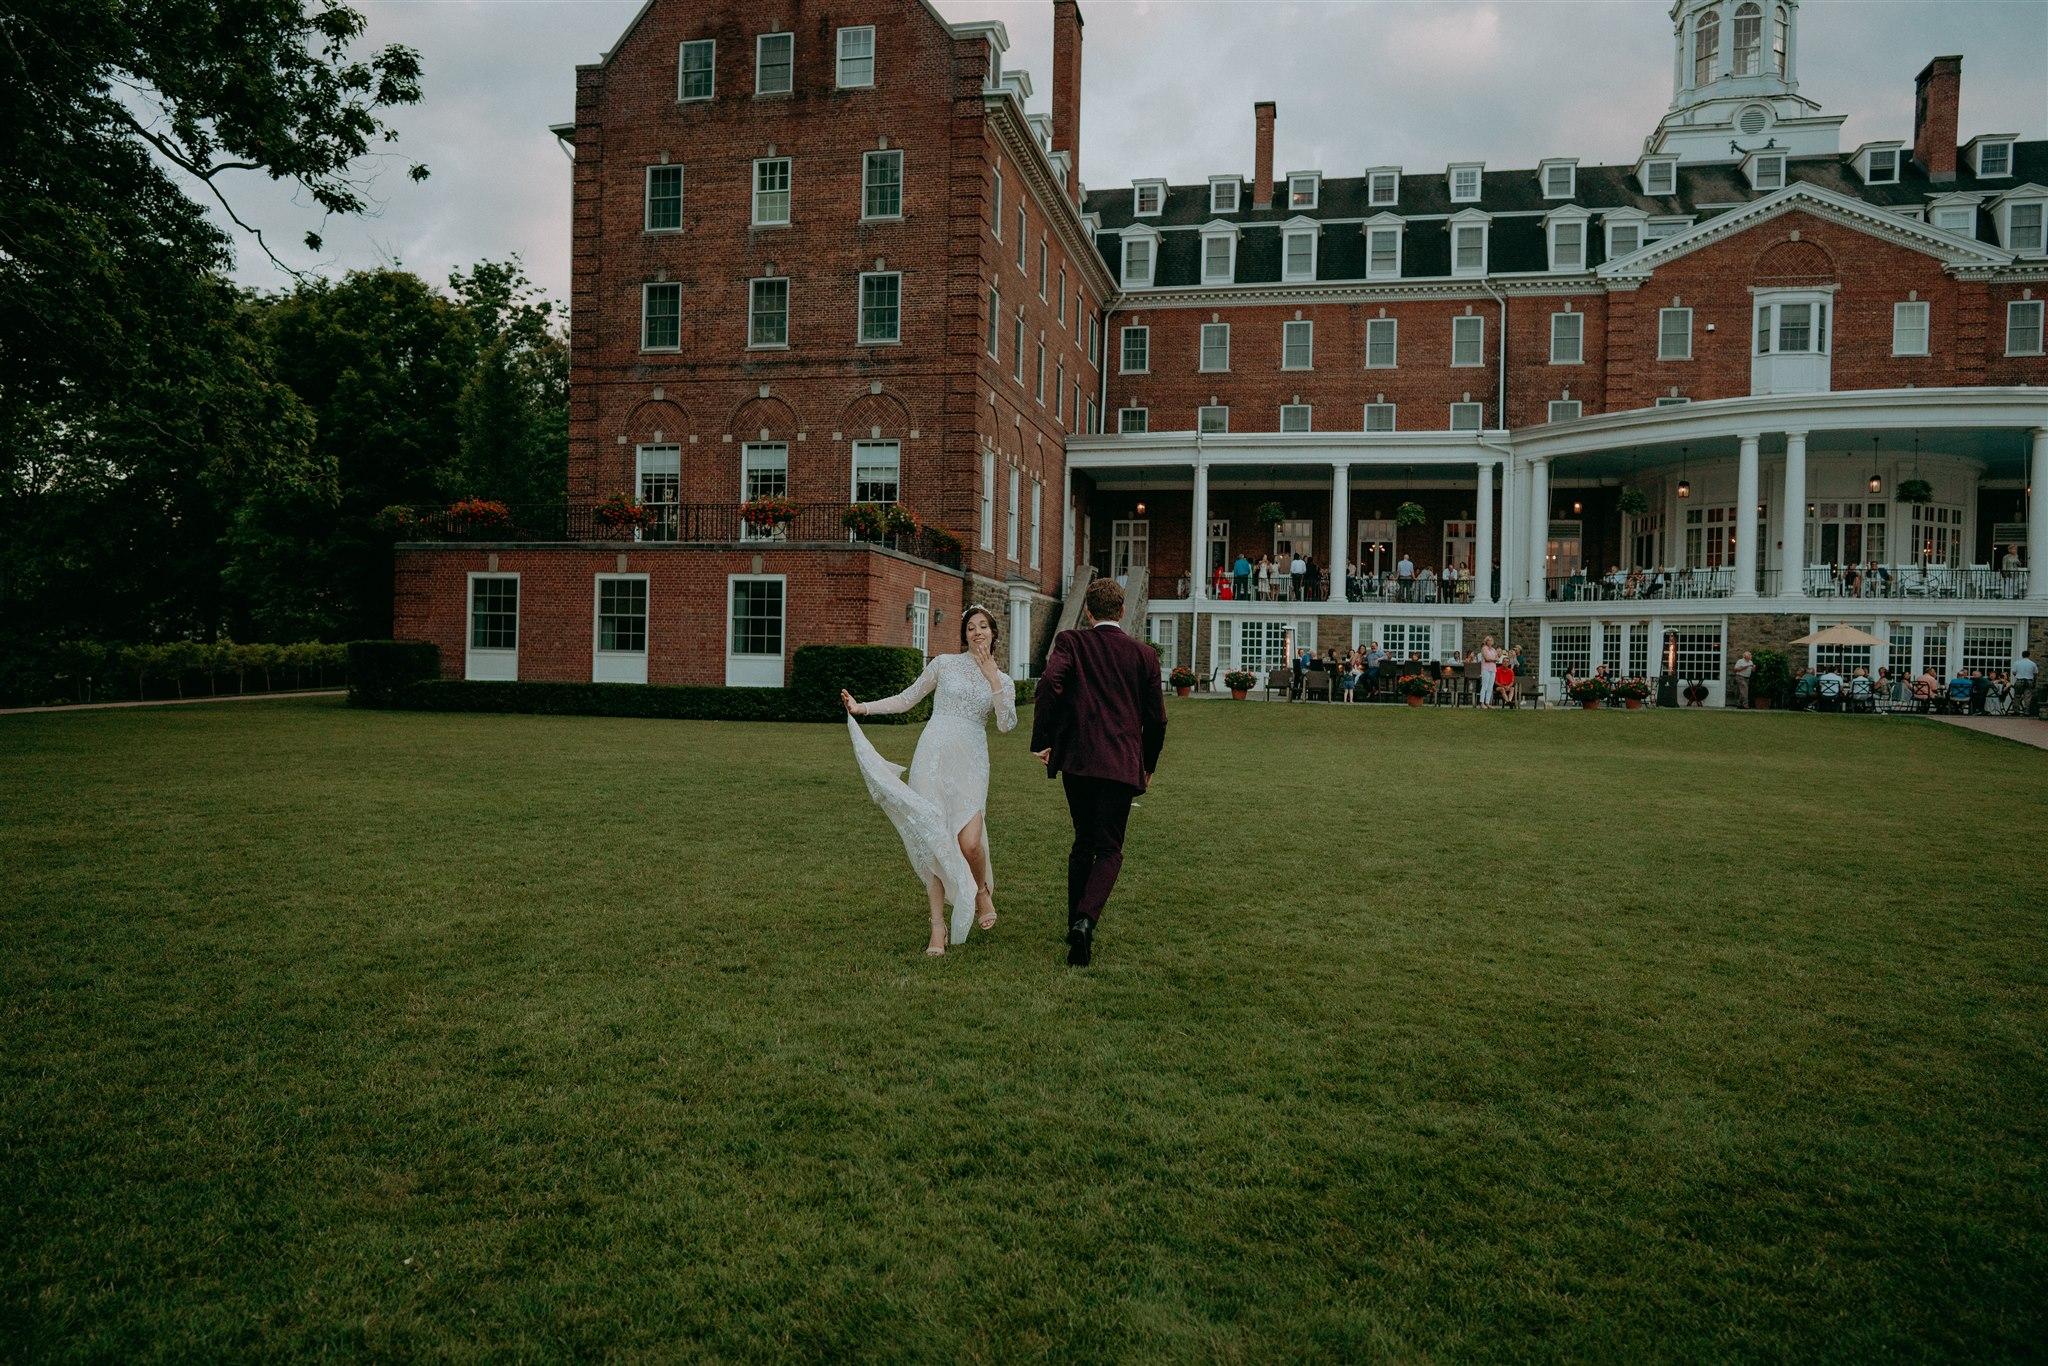 Chellise_Michael_Photography_Hudson_Valley_Wedding_Photographer_Otesaga_Hotel-6110.jpg